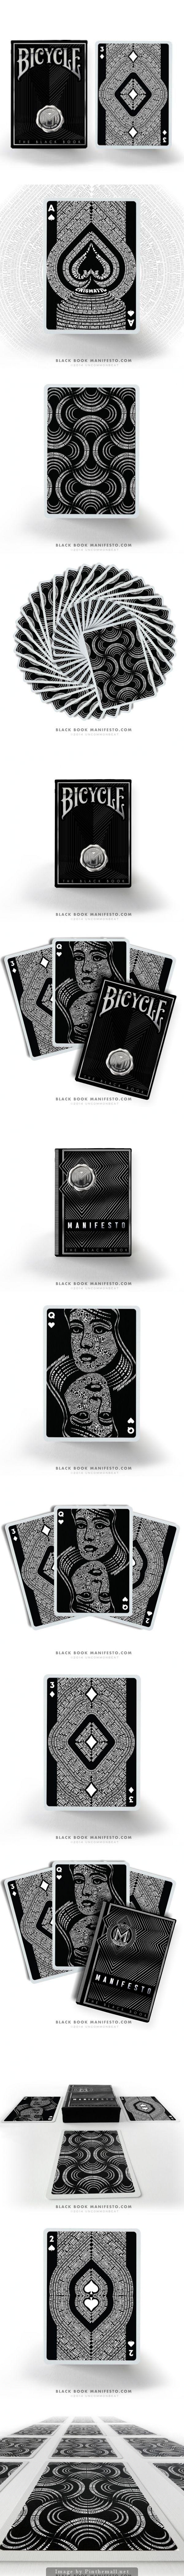 The Black Book Manifesto : A Typographic Deck